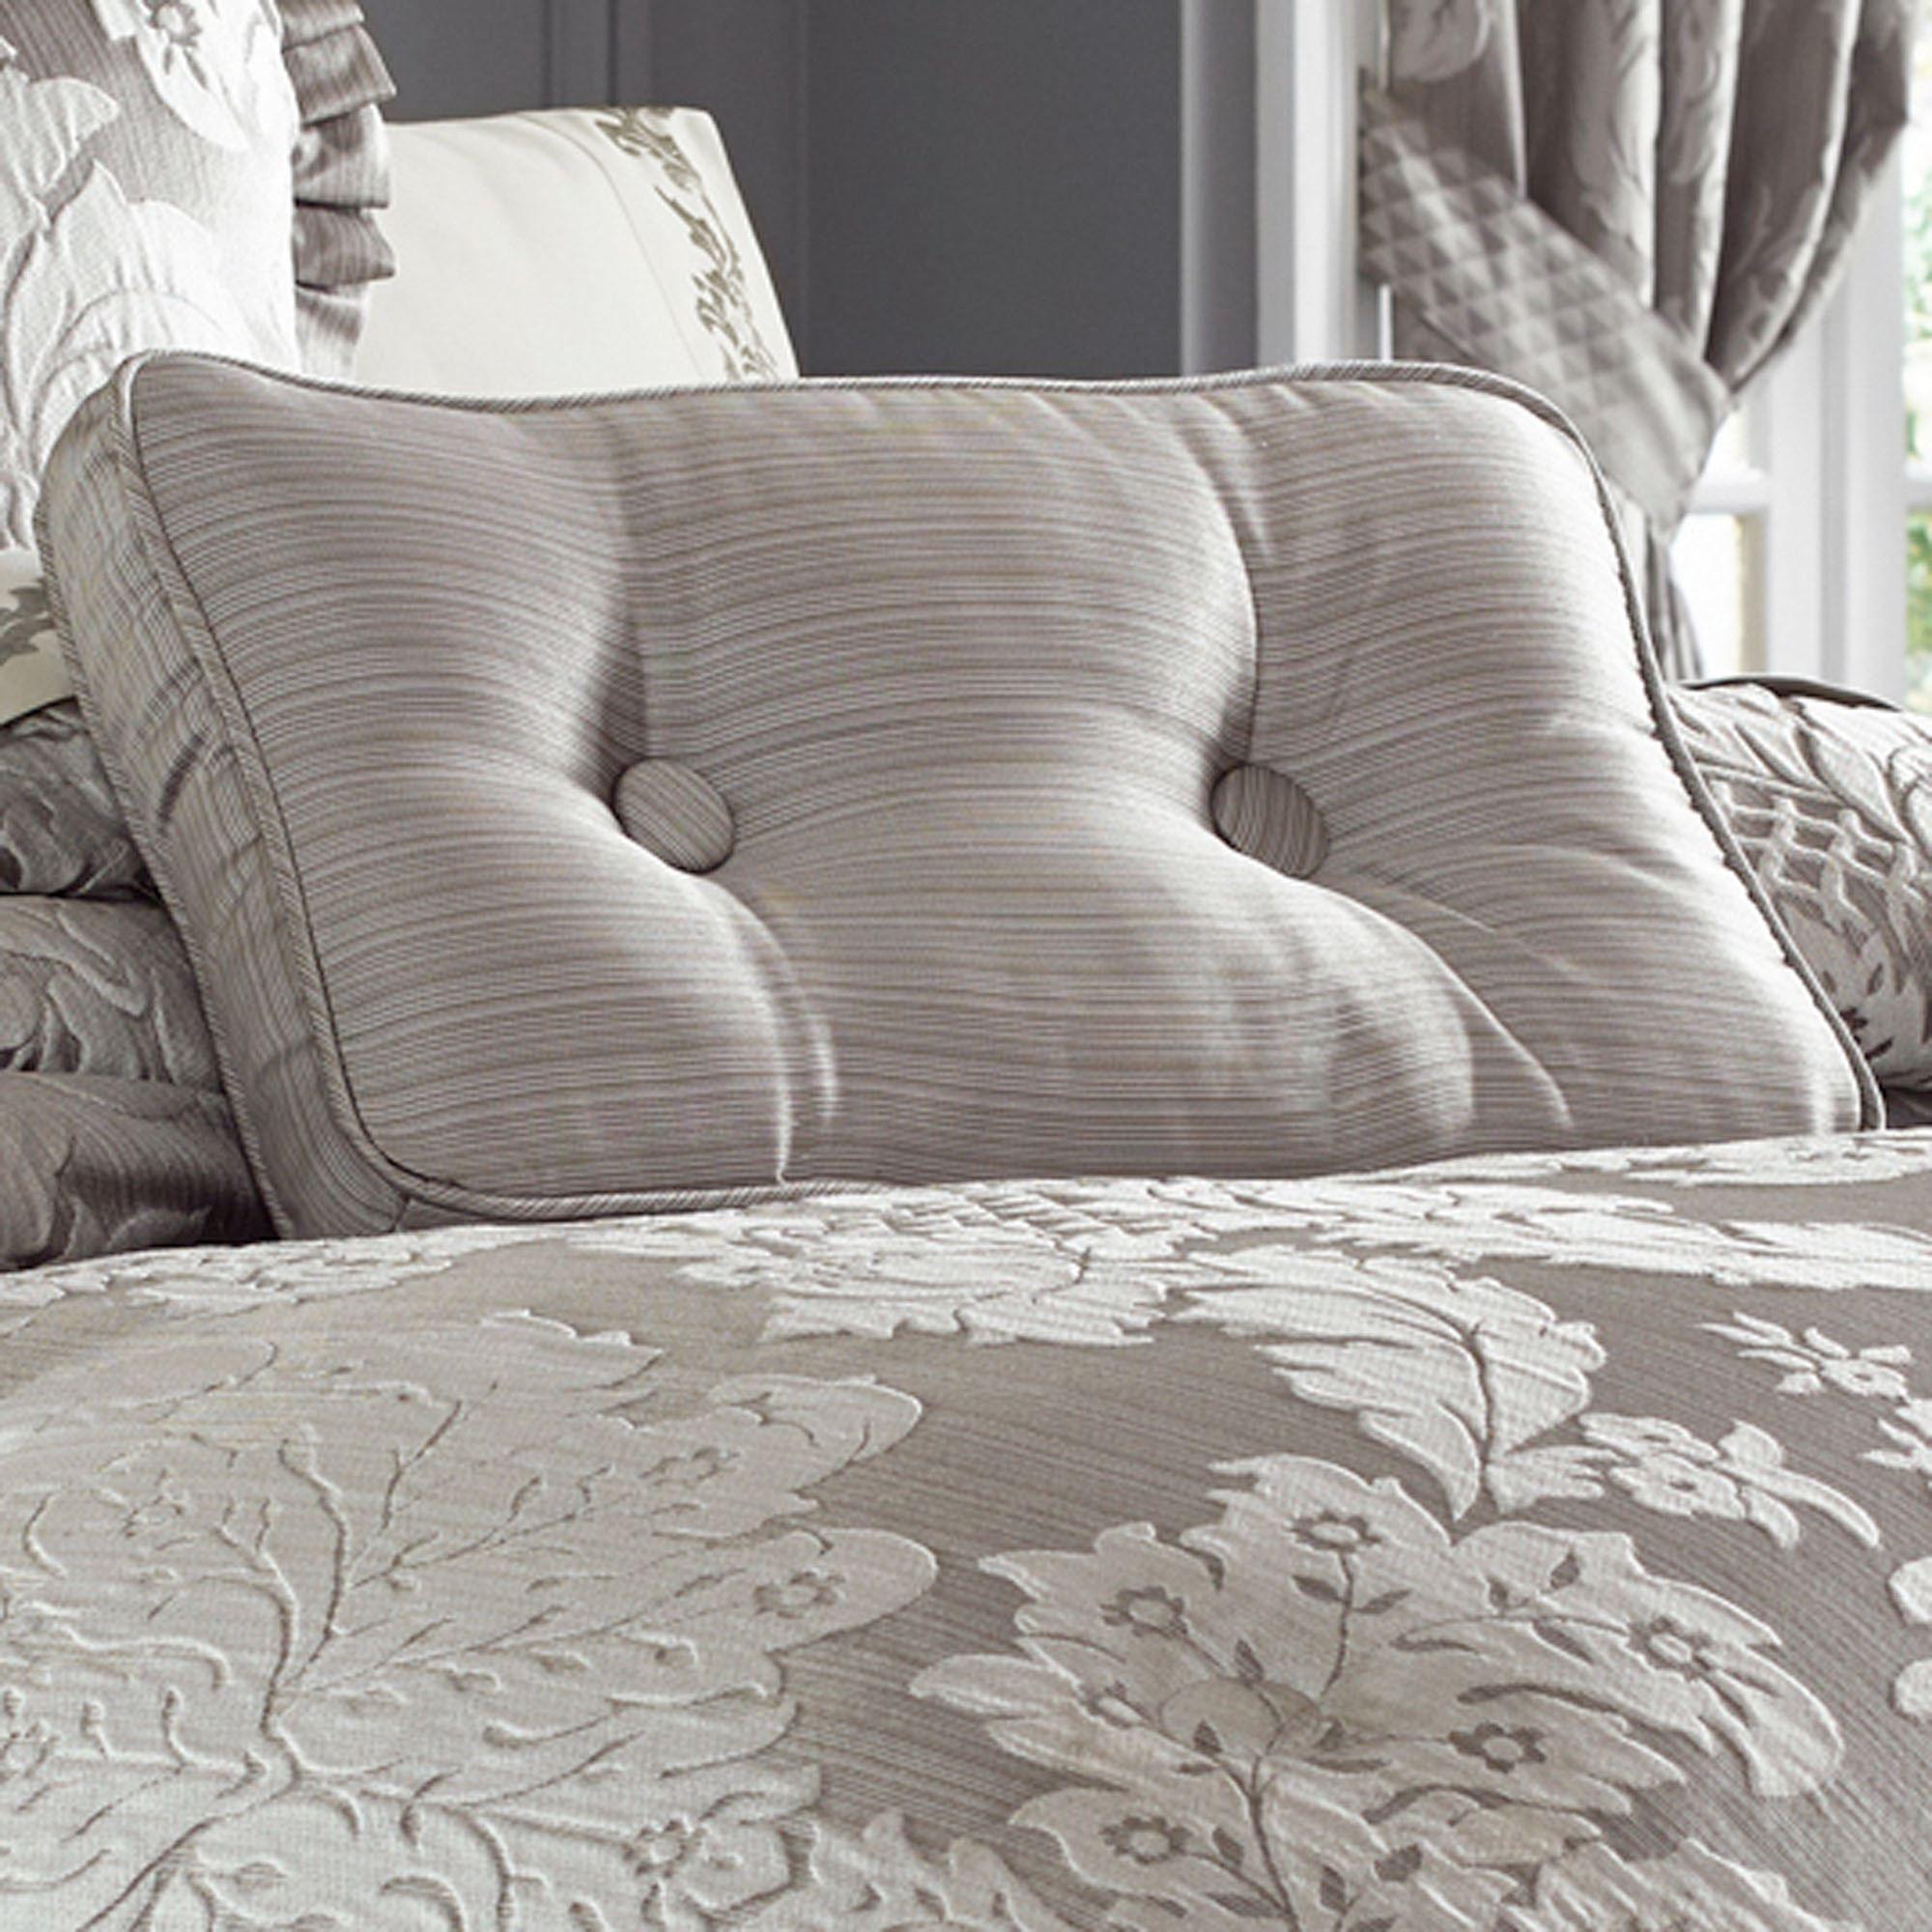 ip botanical set walmart discontinued comforter bedding piece mainstays com sage tufted